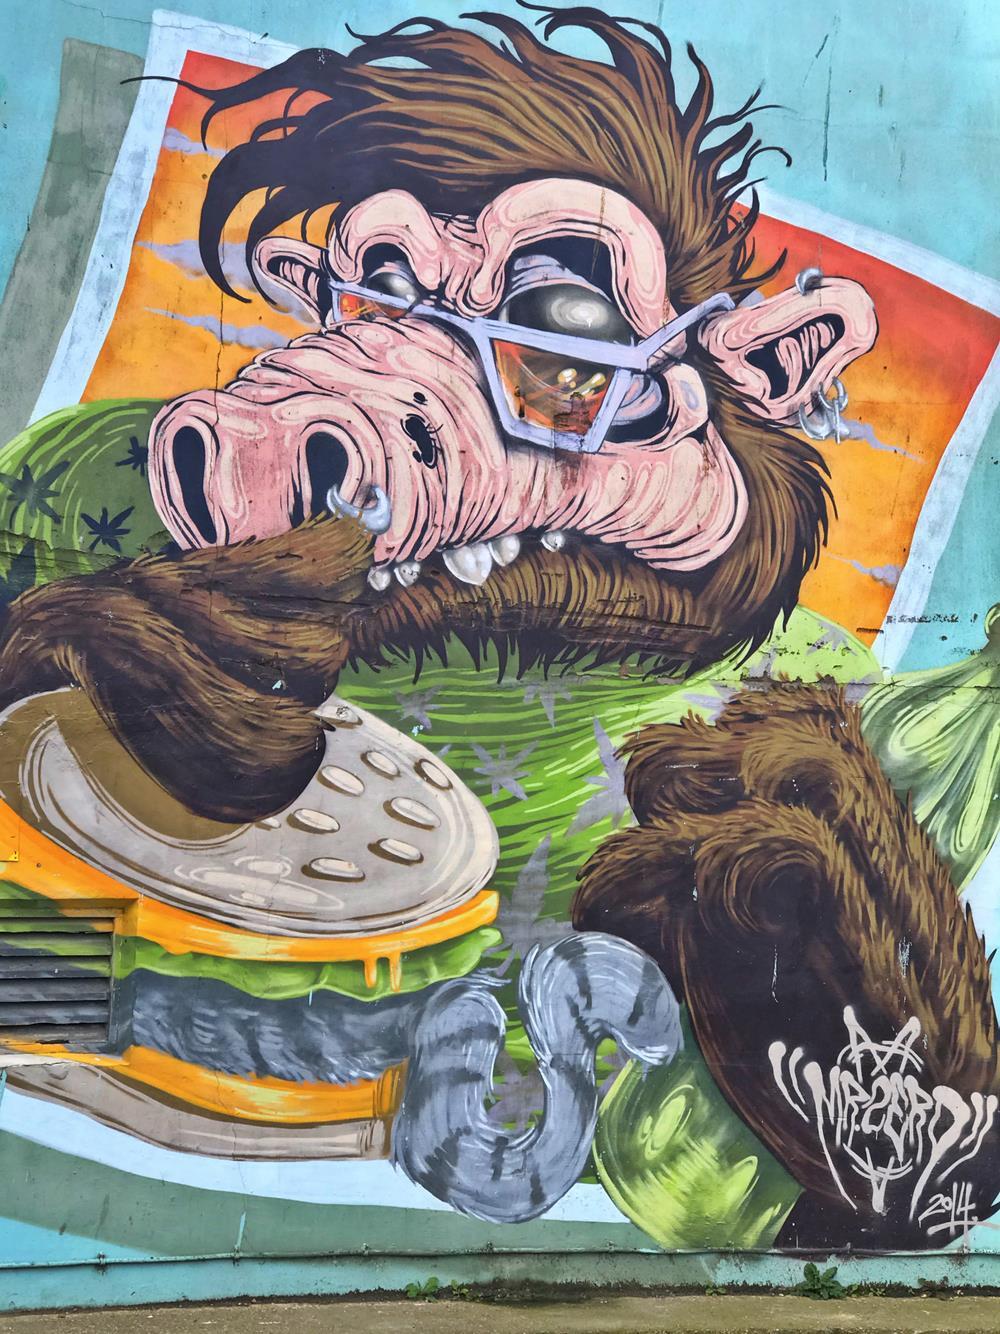 Street art near Donatello in Brighton